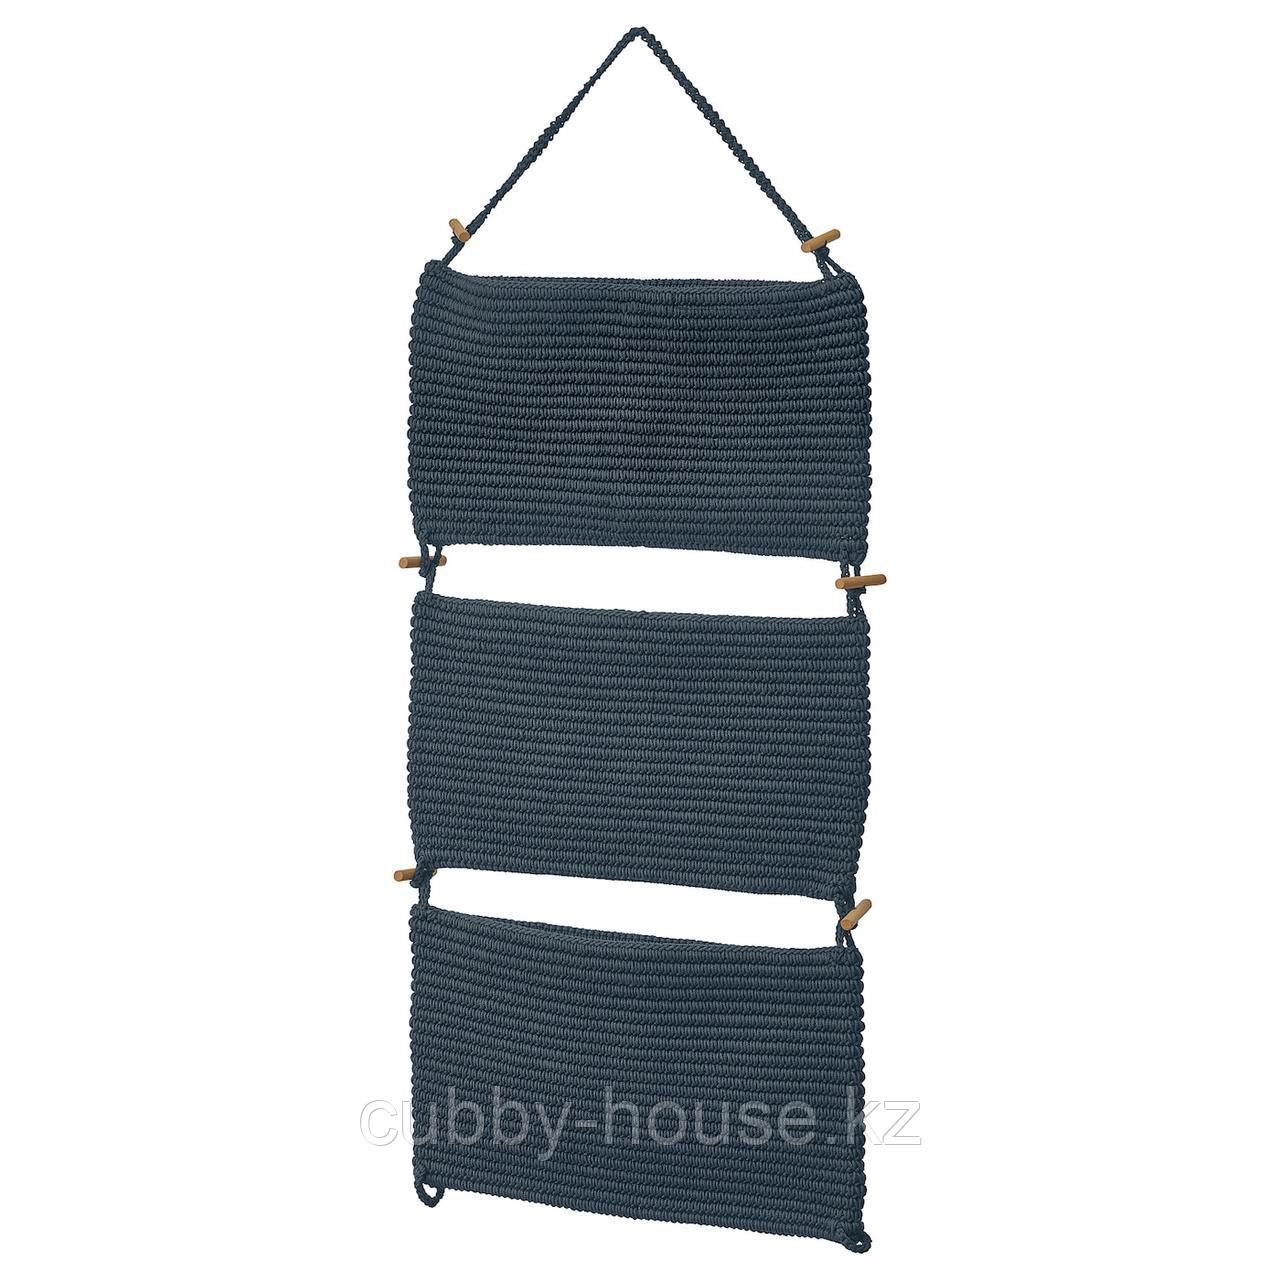 НОРДРЭНА Подвесной модуль д/хранения, синий, 35x90 см